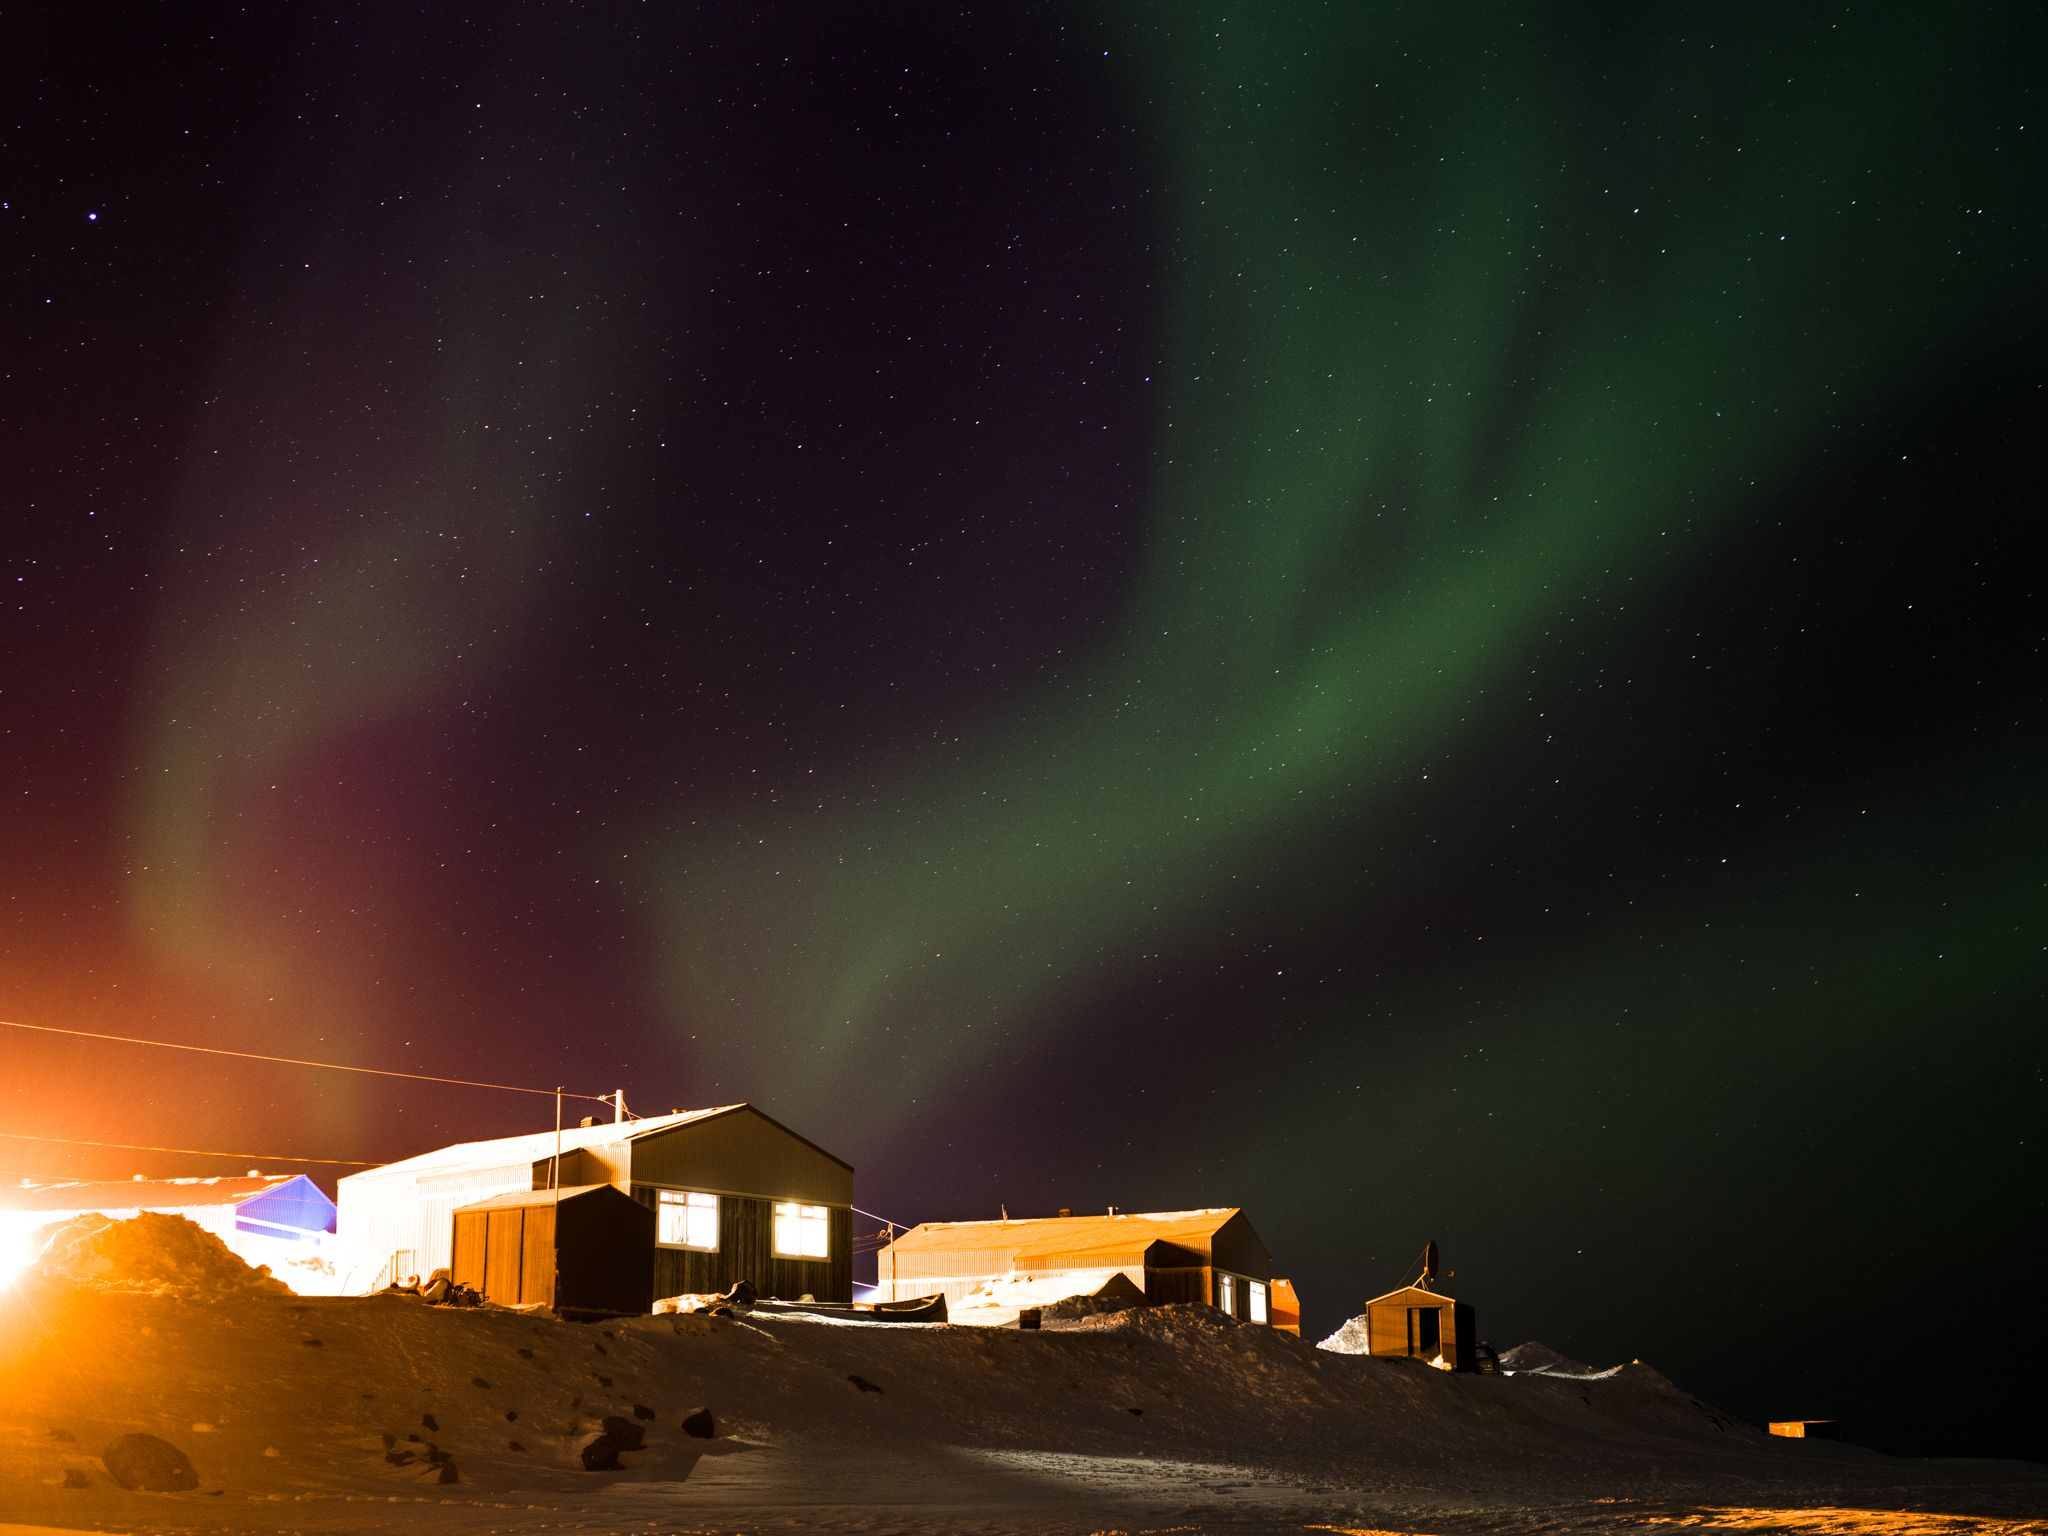 aurora borealis in Nunavik by Alexi Hobbs for Air Inuit